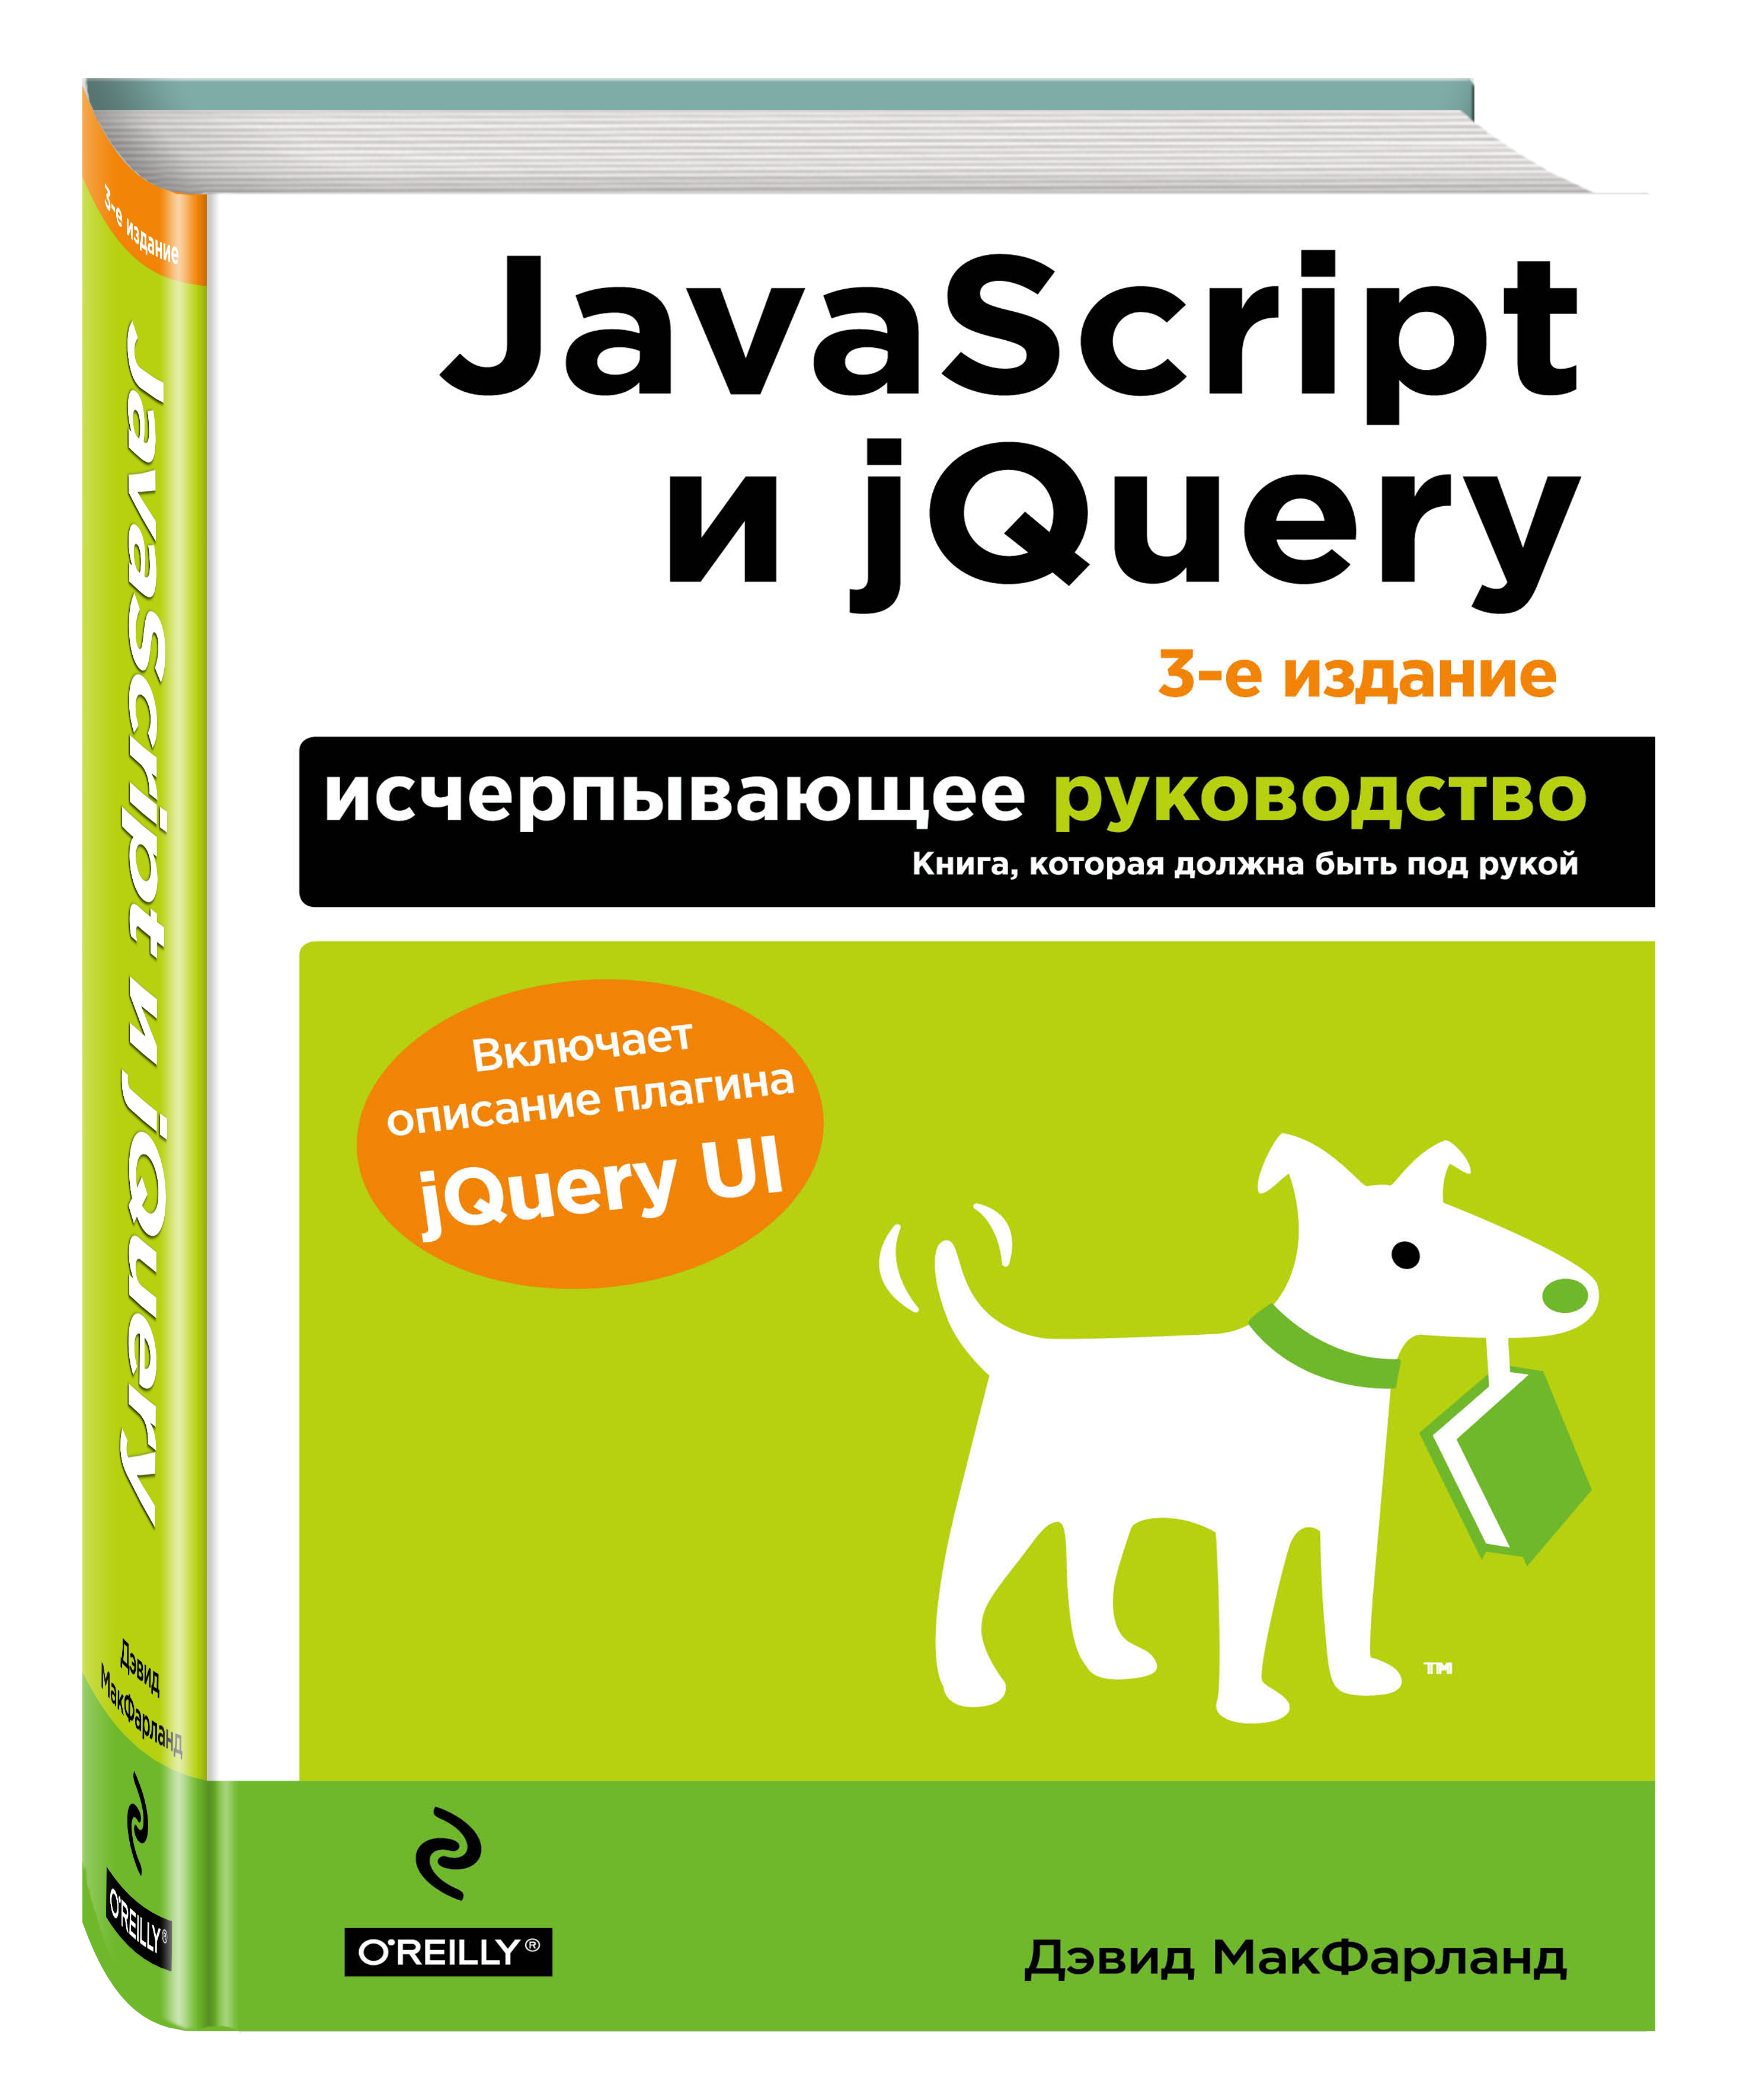 Дэвид Макфарланд JavaScript и jQuery. Исчерпывающее руководство. 3-е издание overlord маруяма куганэ мп3 аудиокнига том 8 скачать